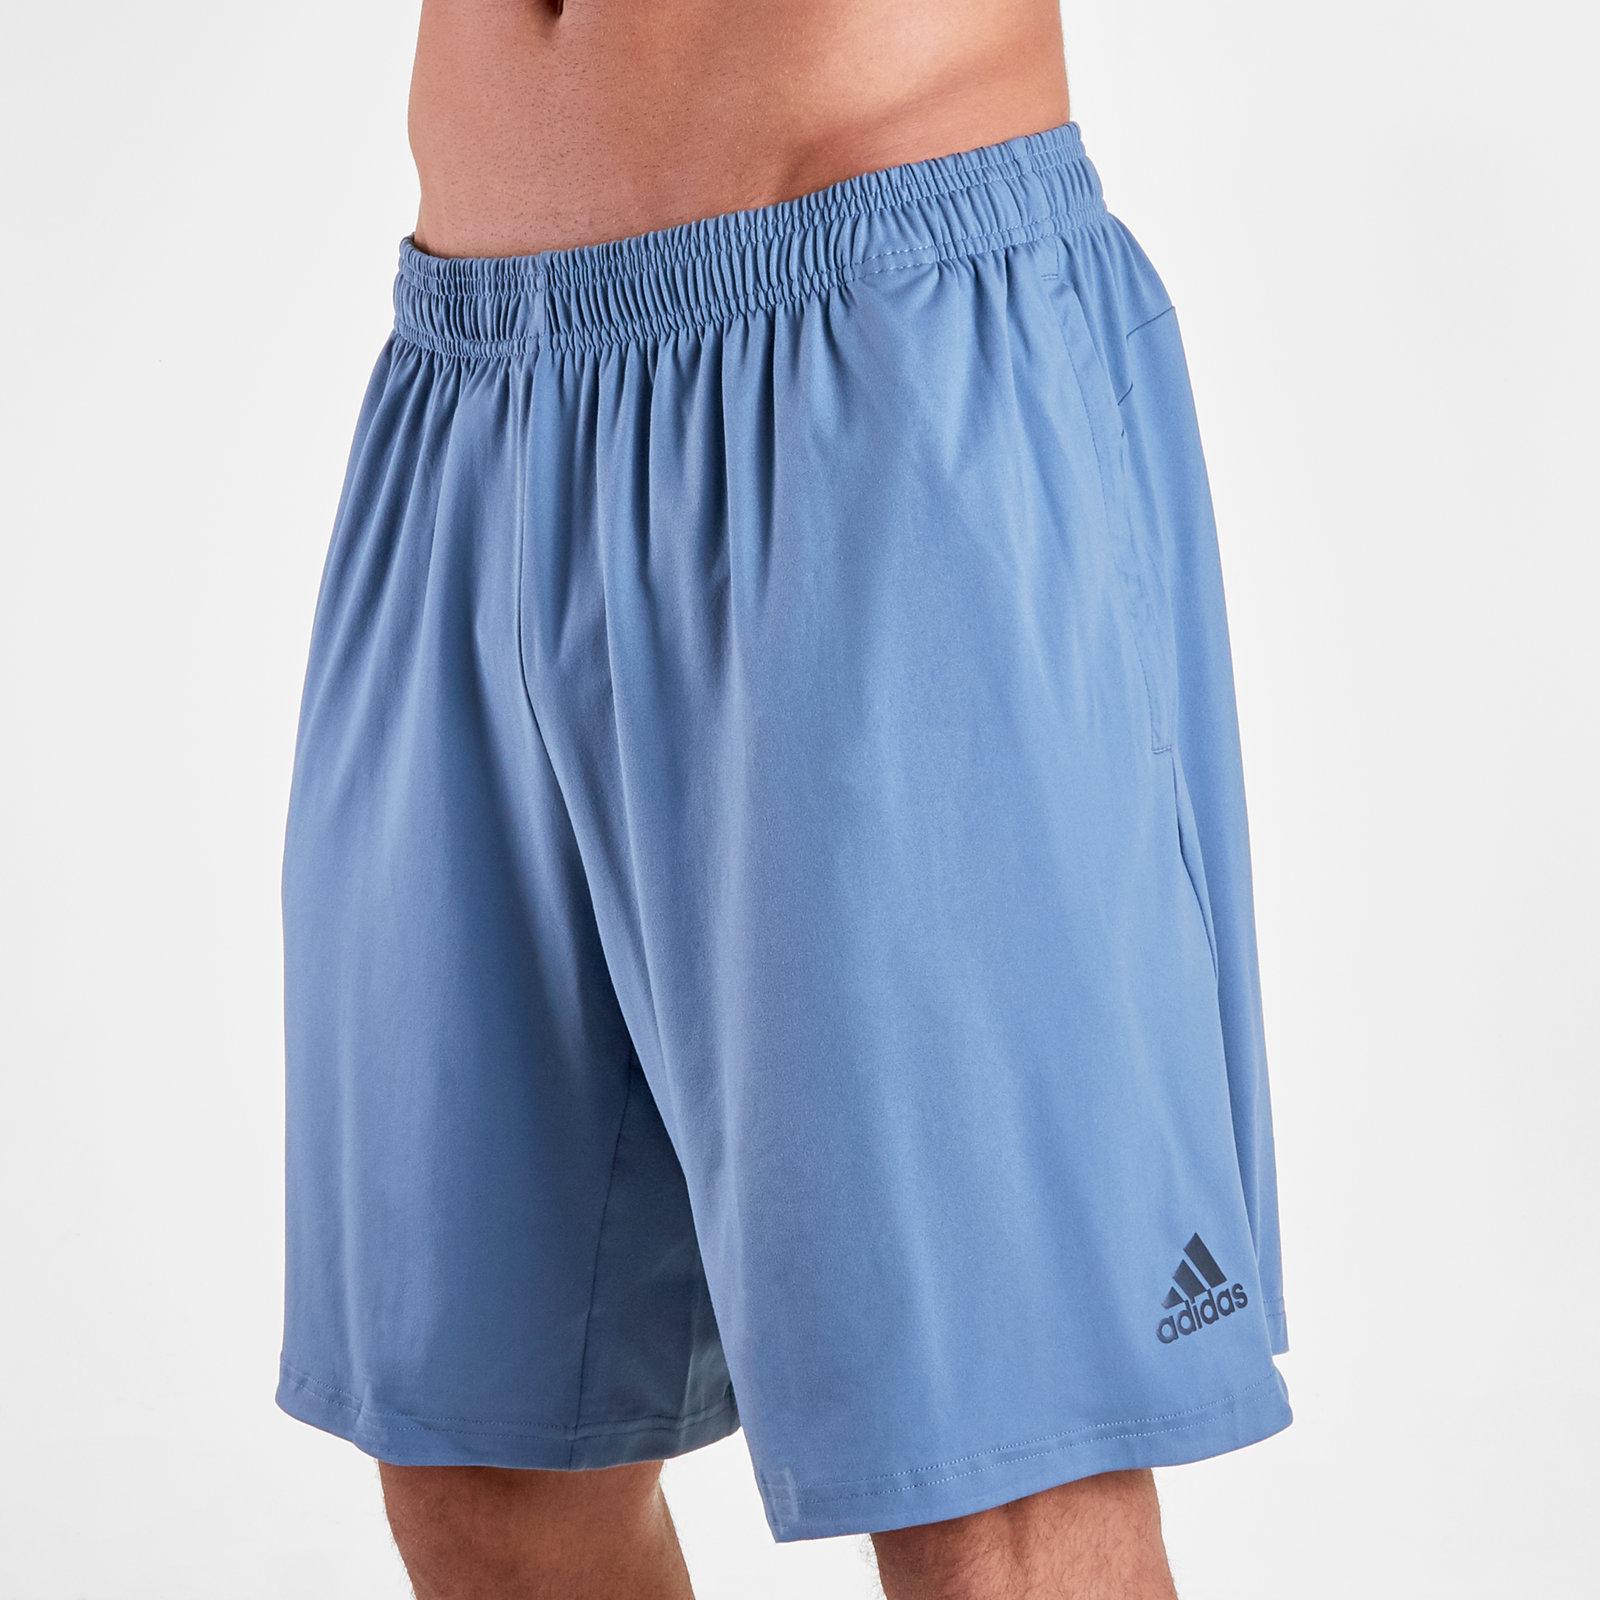 nett Details zu adidas Mens 4KRFT ClimaLite Prime Training Sports Gym Shorts Pants Grey  Kostenloser Versand